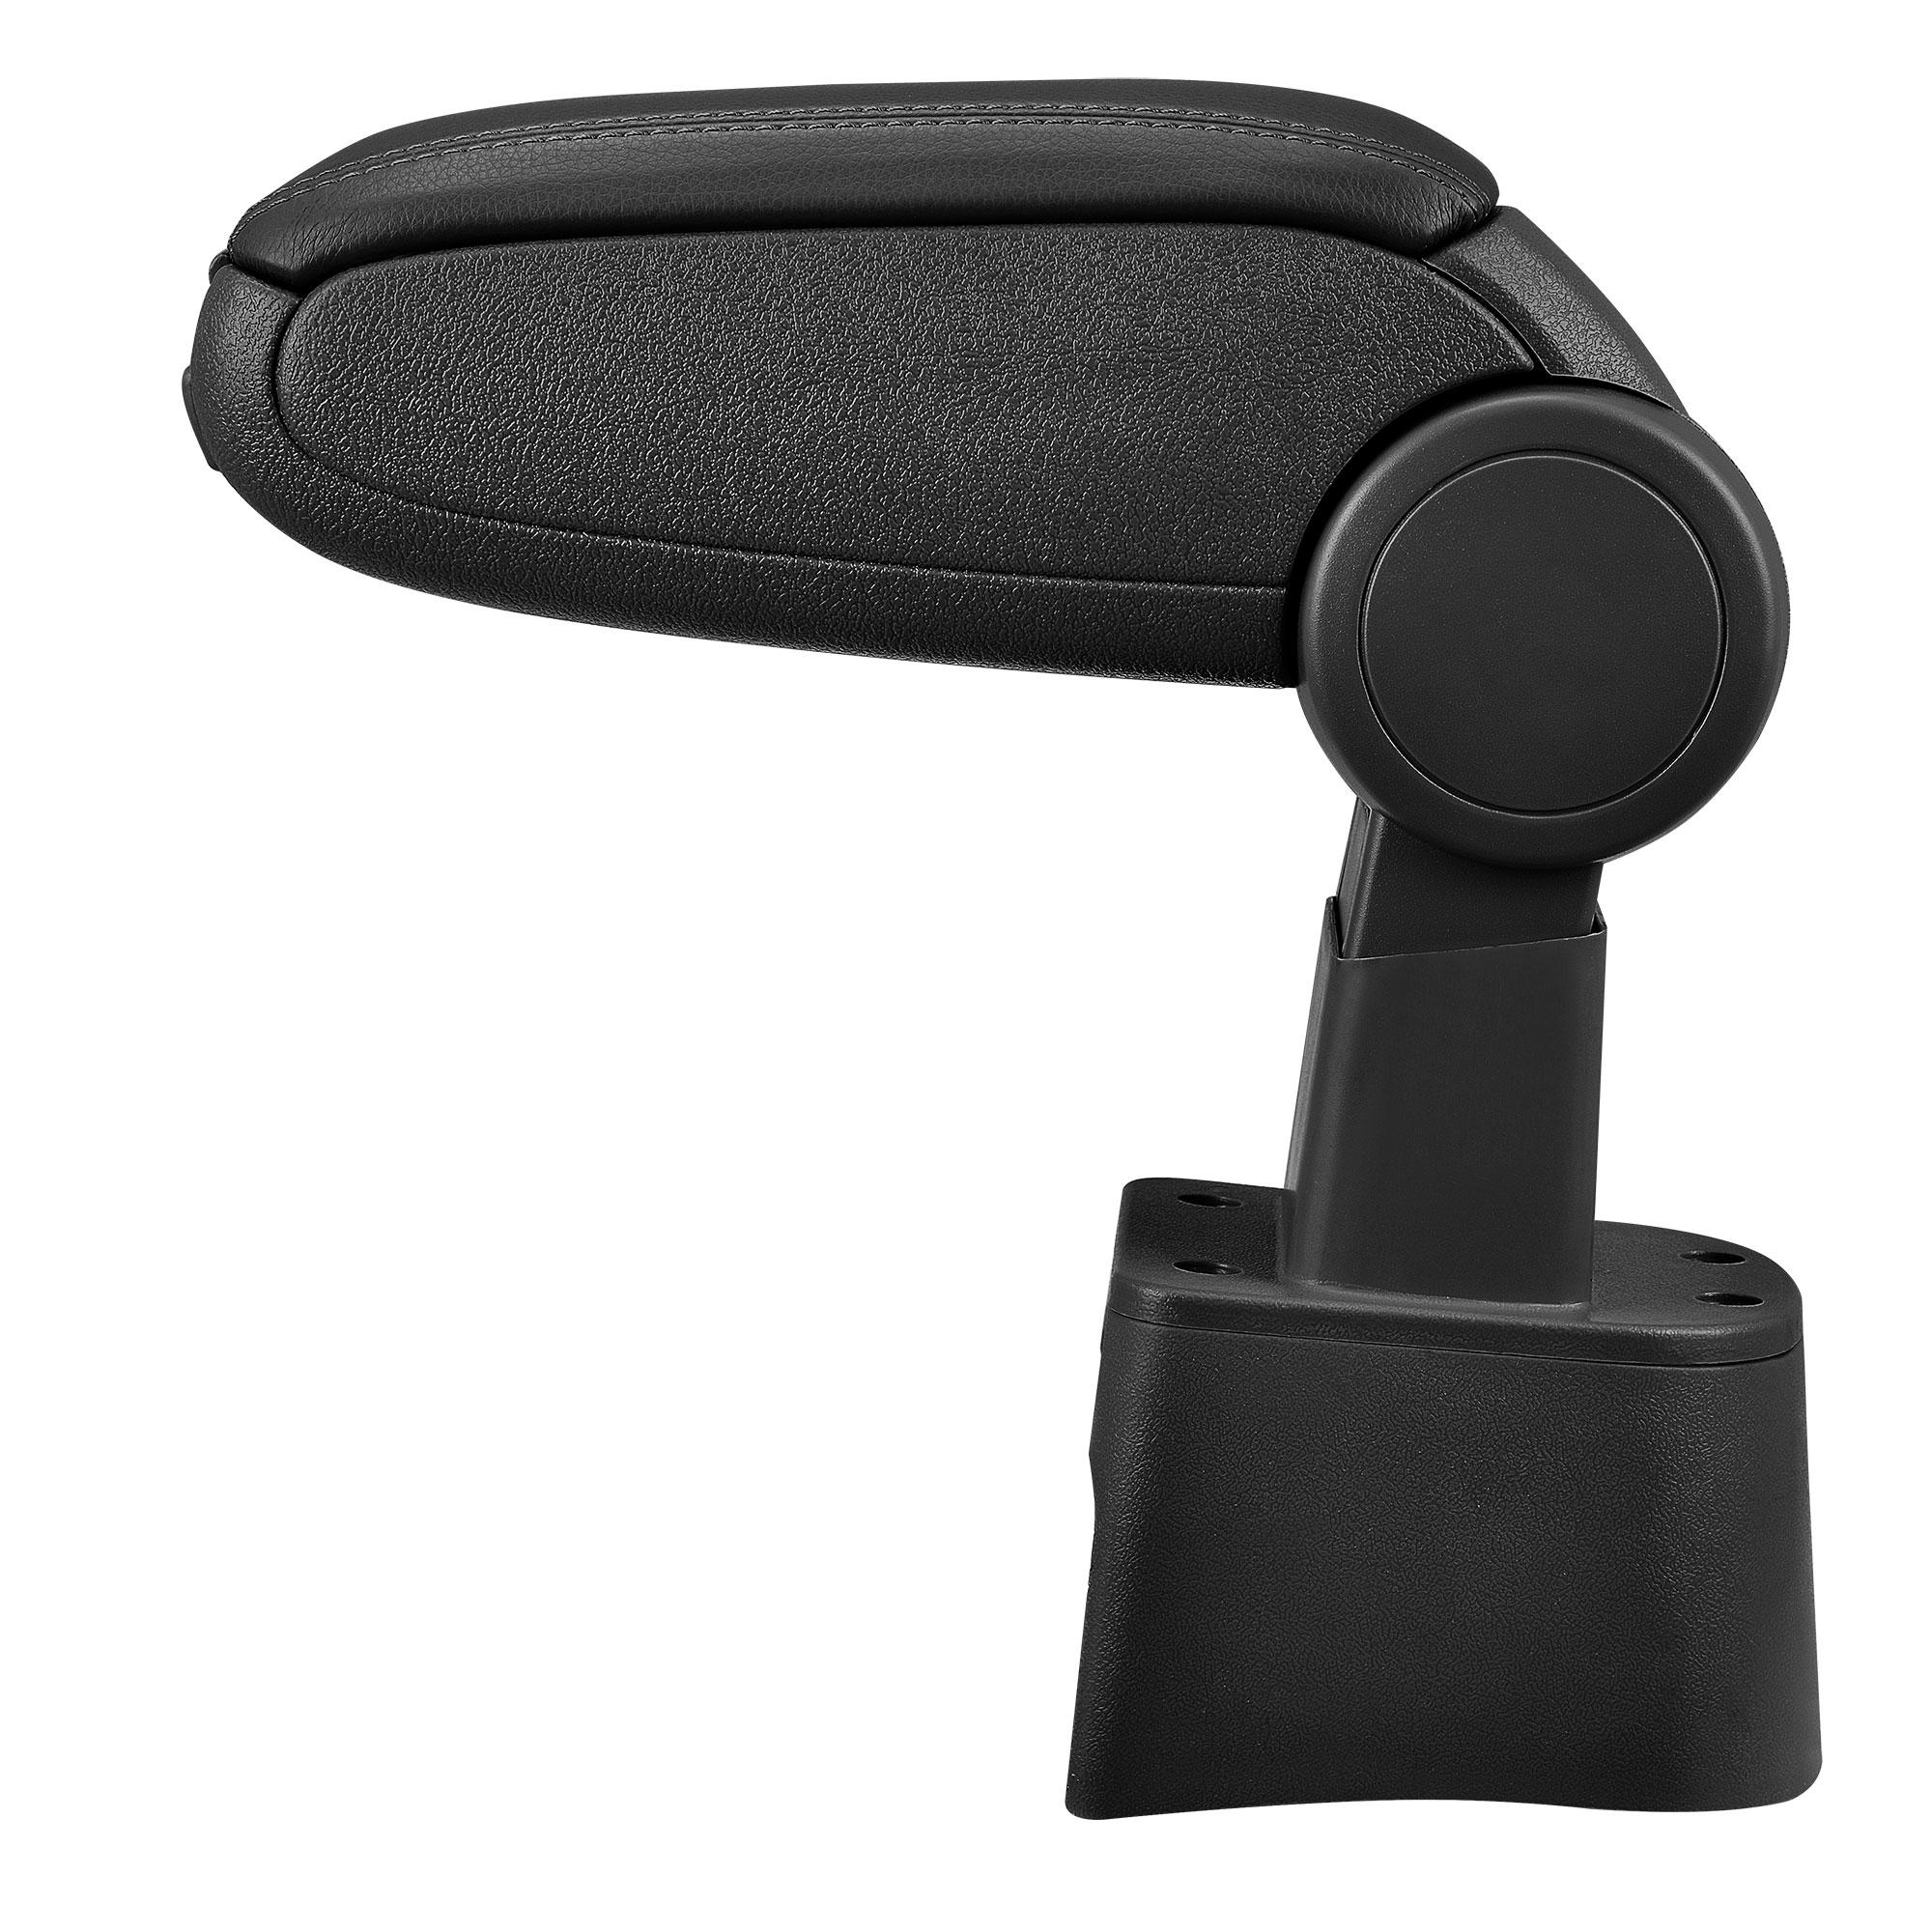 accoudoir neuf seat ibiza 3 iii cordoba type 6l fr cupra 2002 2008 cuir noir ebay. Black Bedroom Furniture Sets. Home Design Ideas